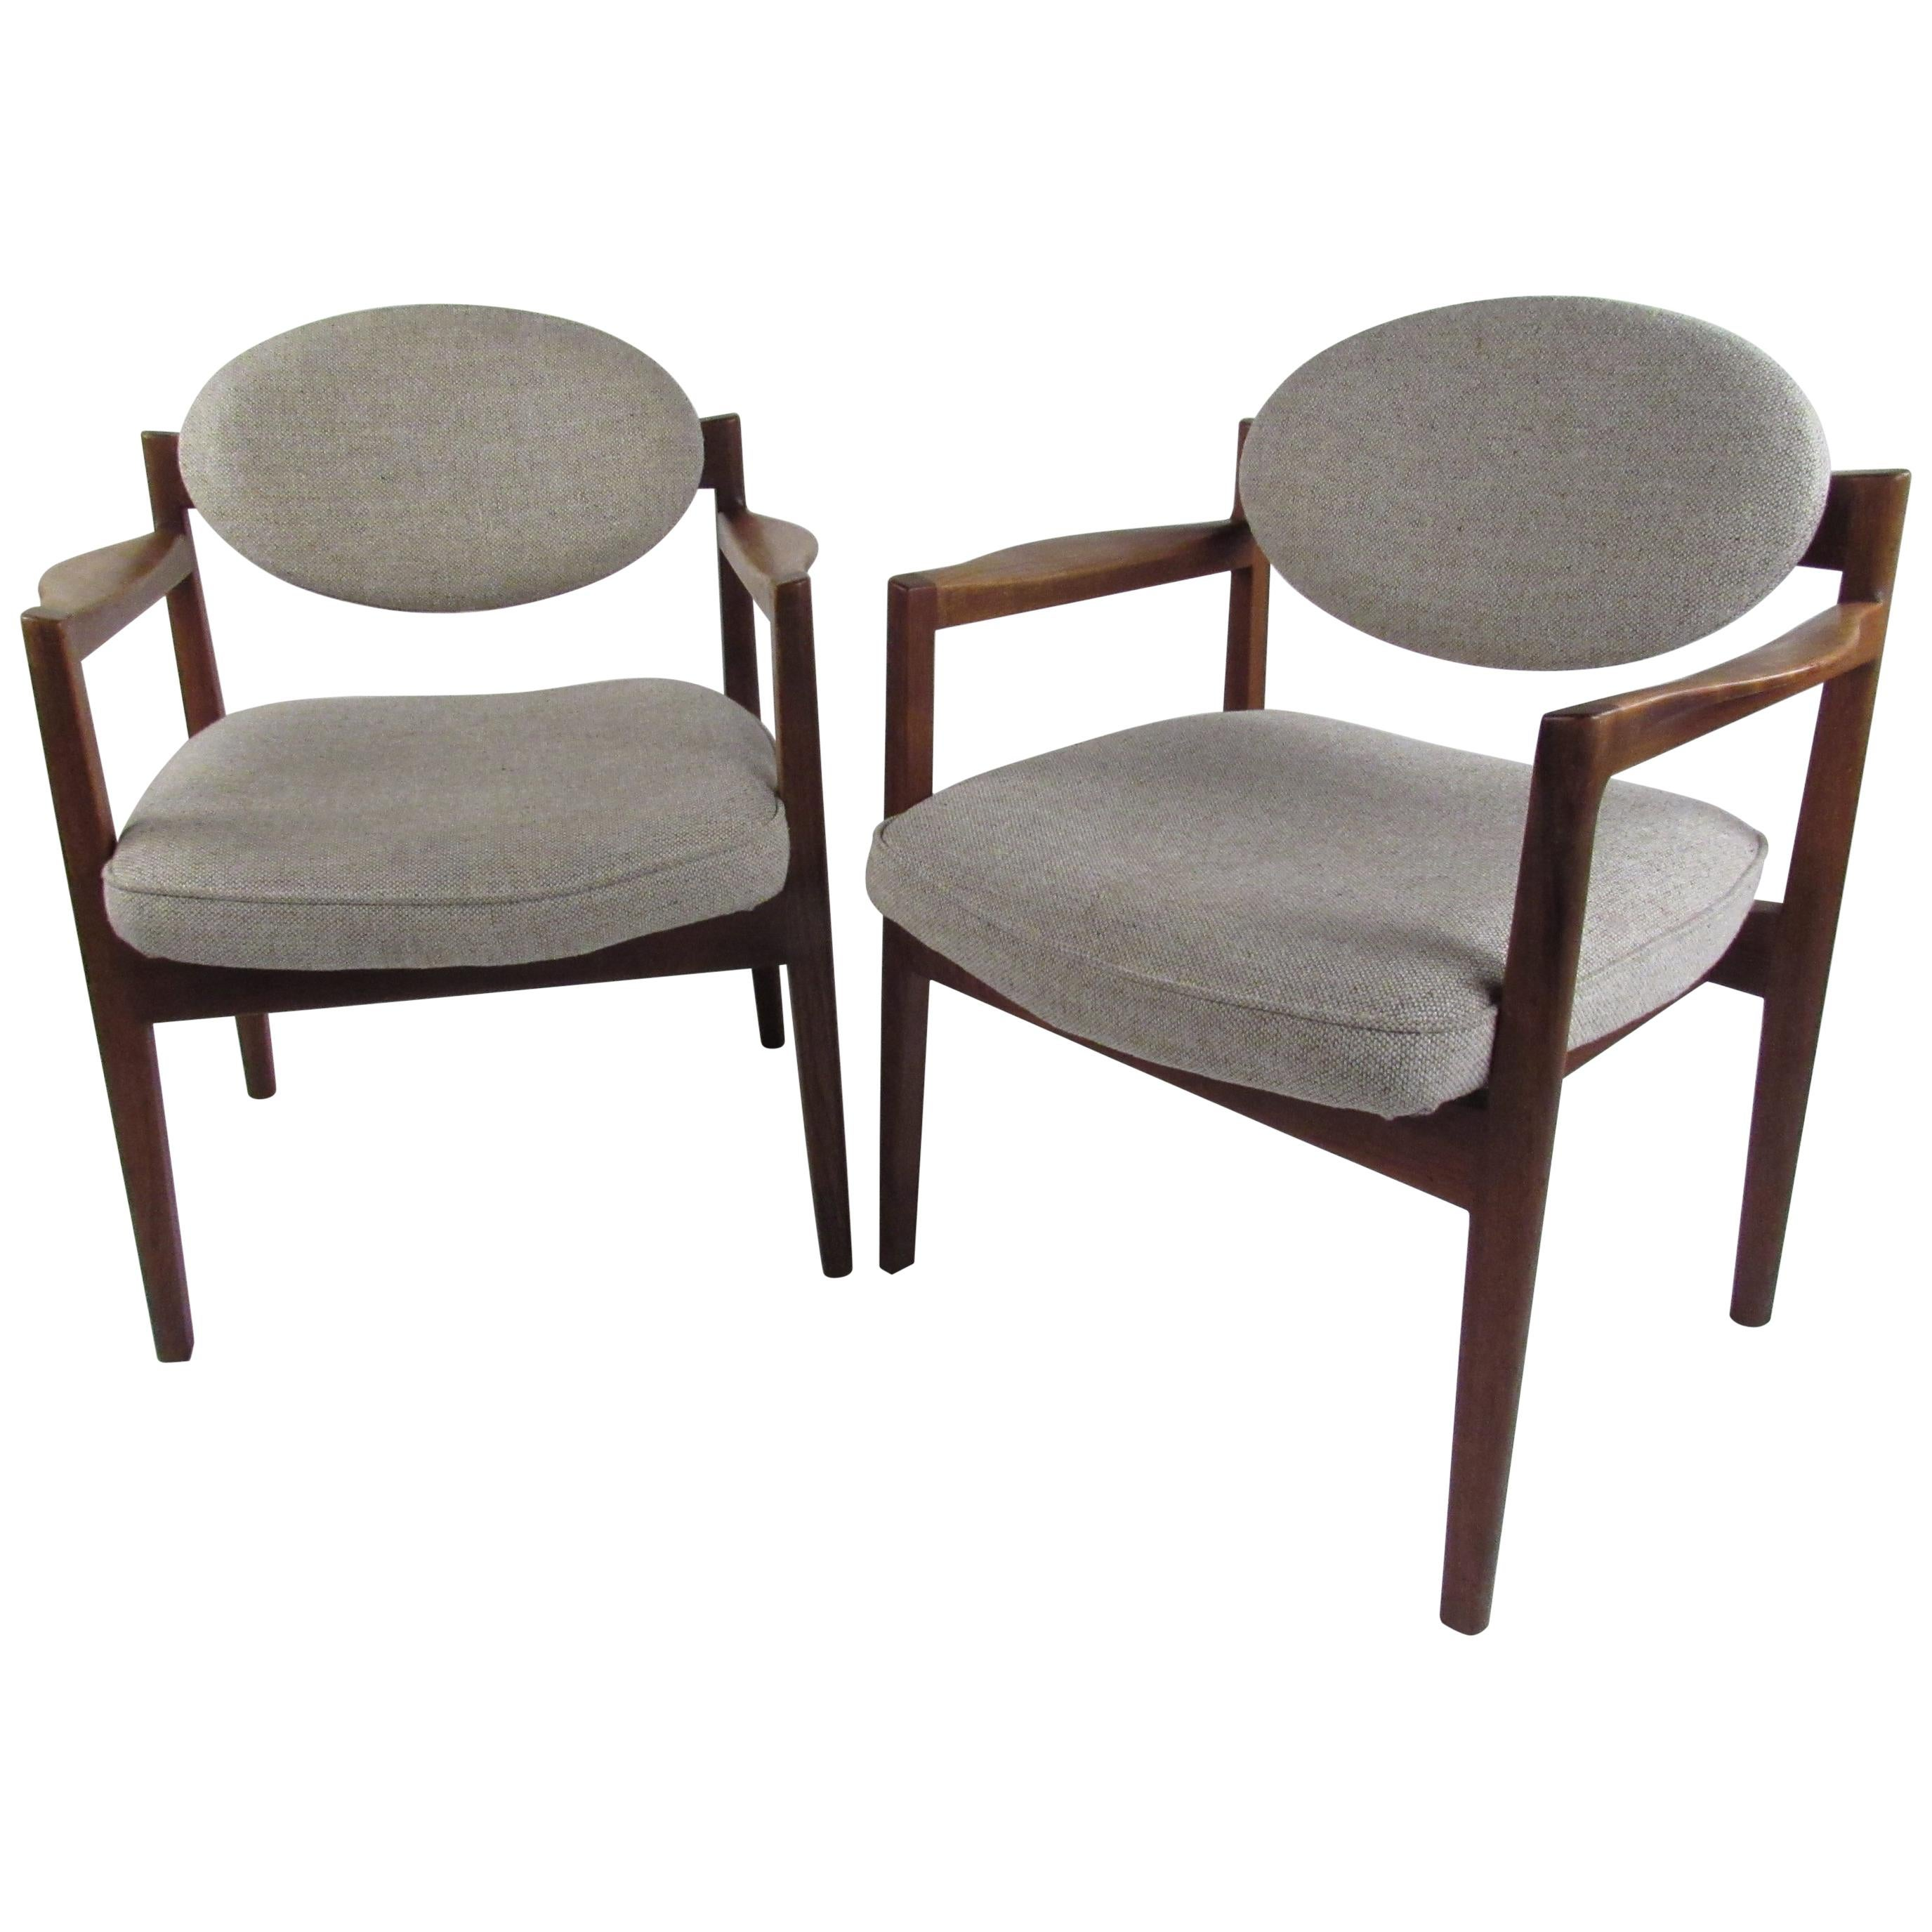 Pair of Mid-Century Modern Walnut Side Chairs